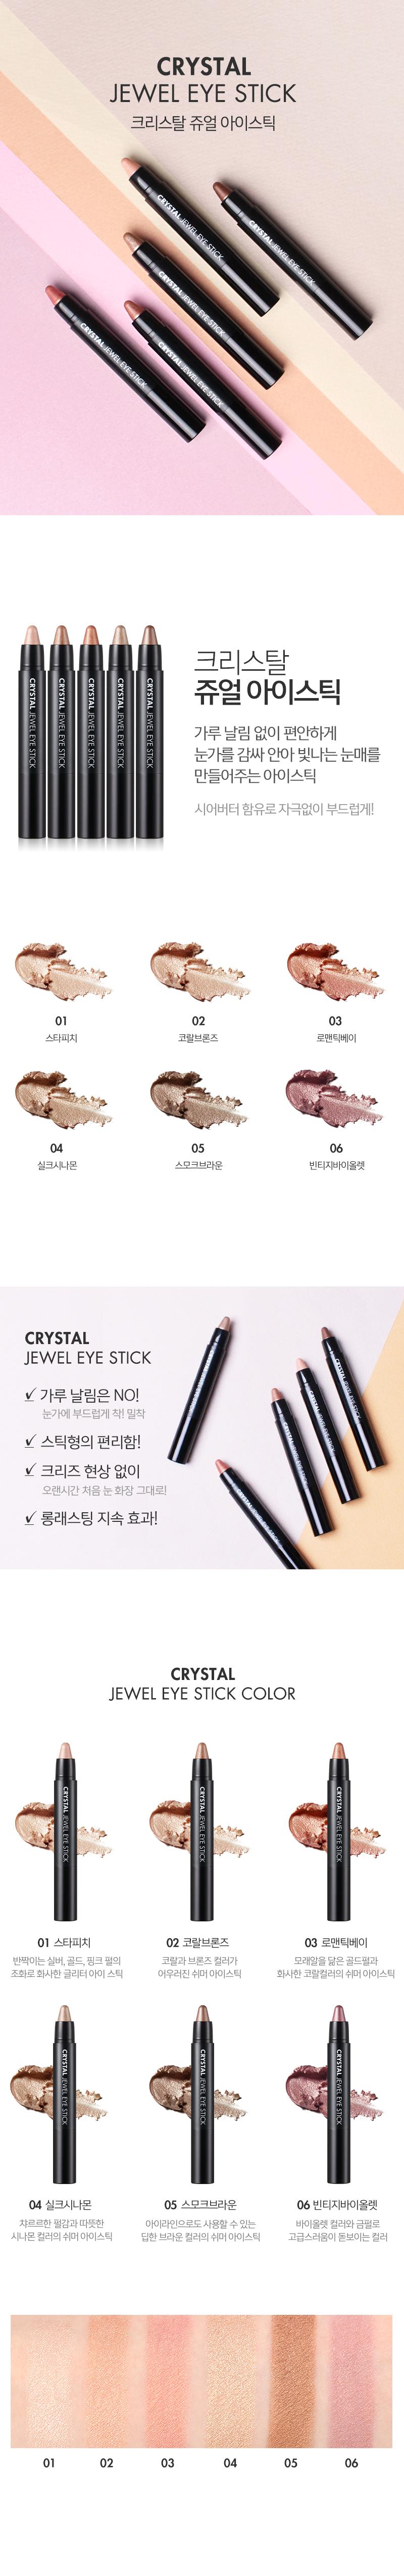 Tony Moly Crystal Jewel Eye Stick 1.7g malaysia singapore indonesia